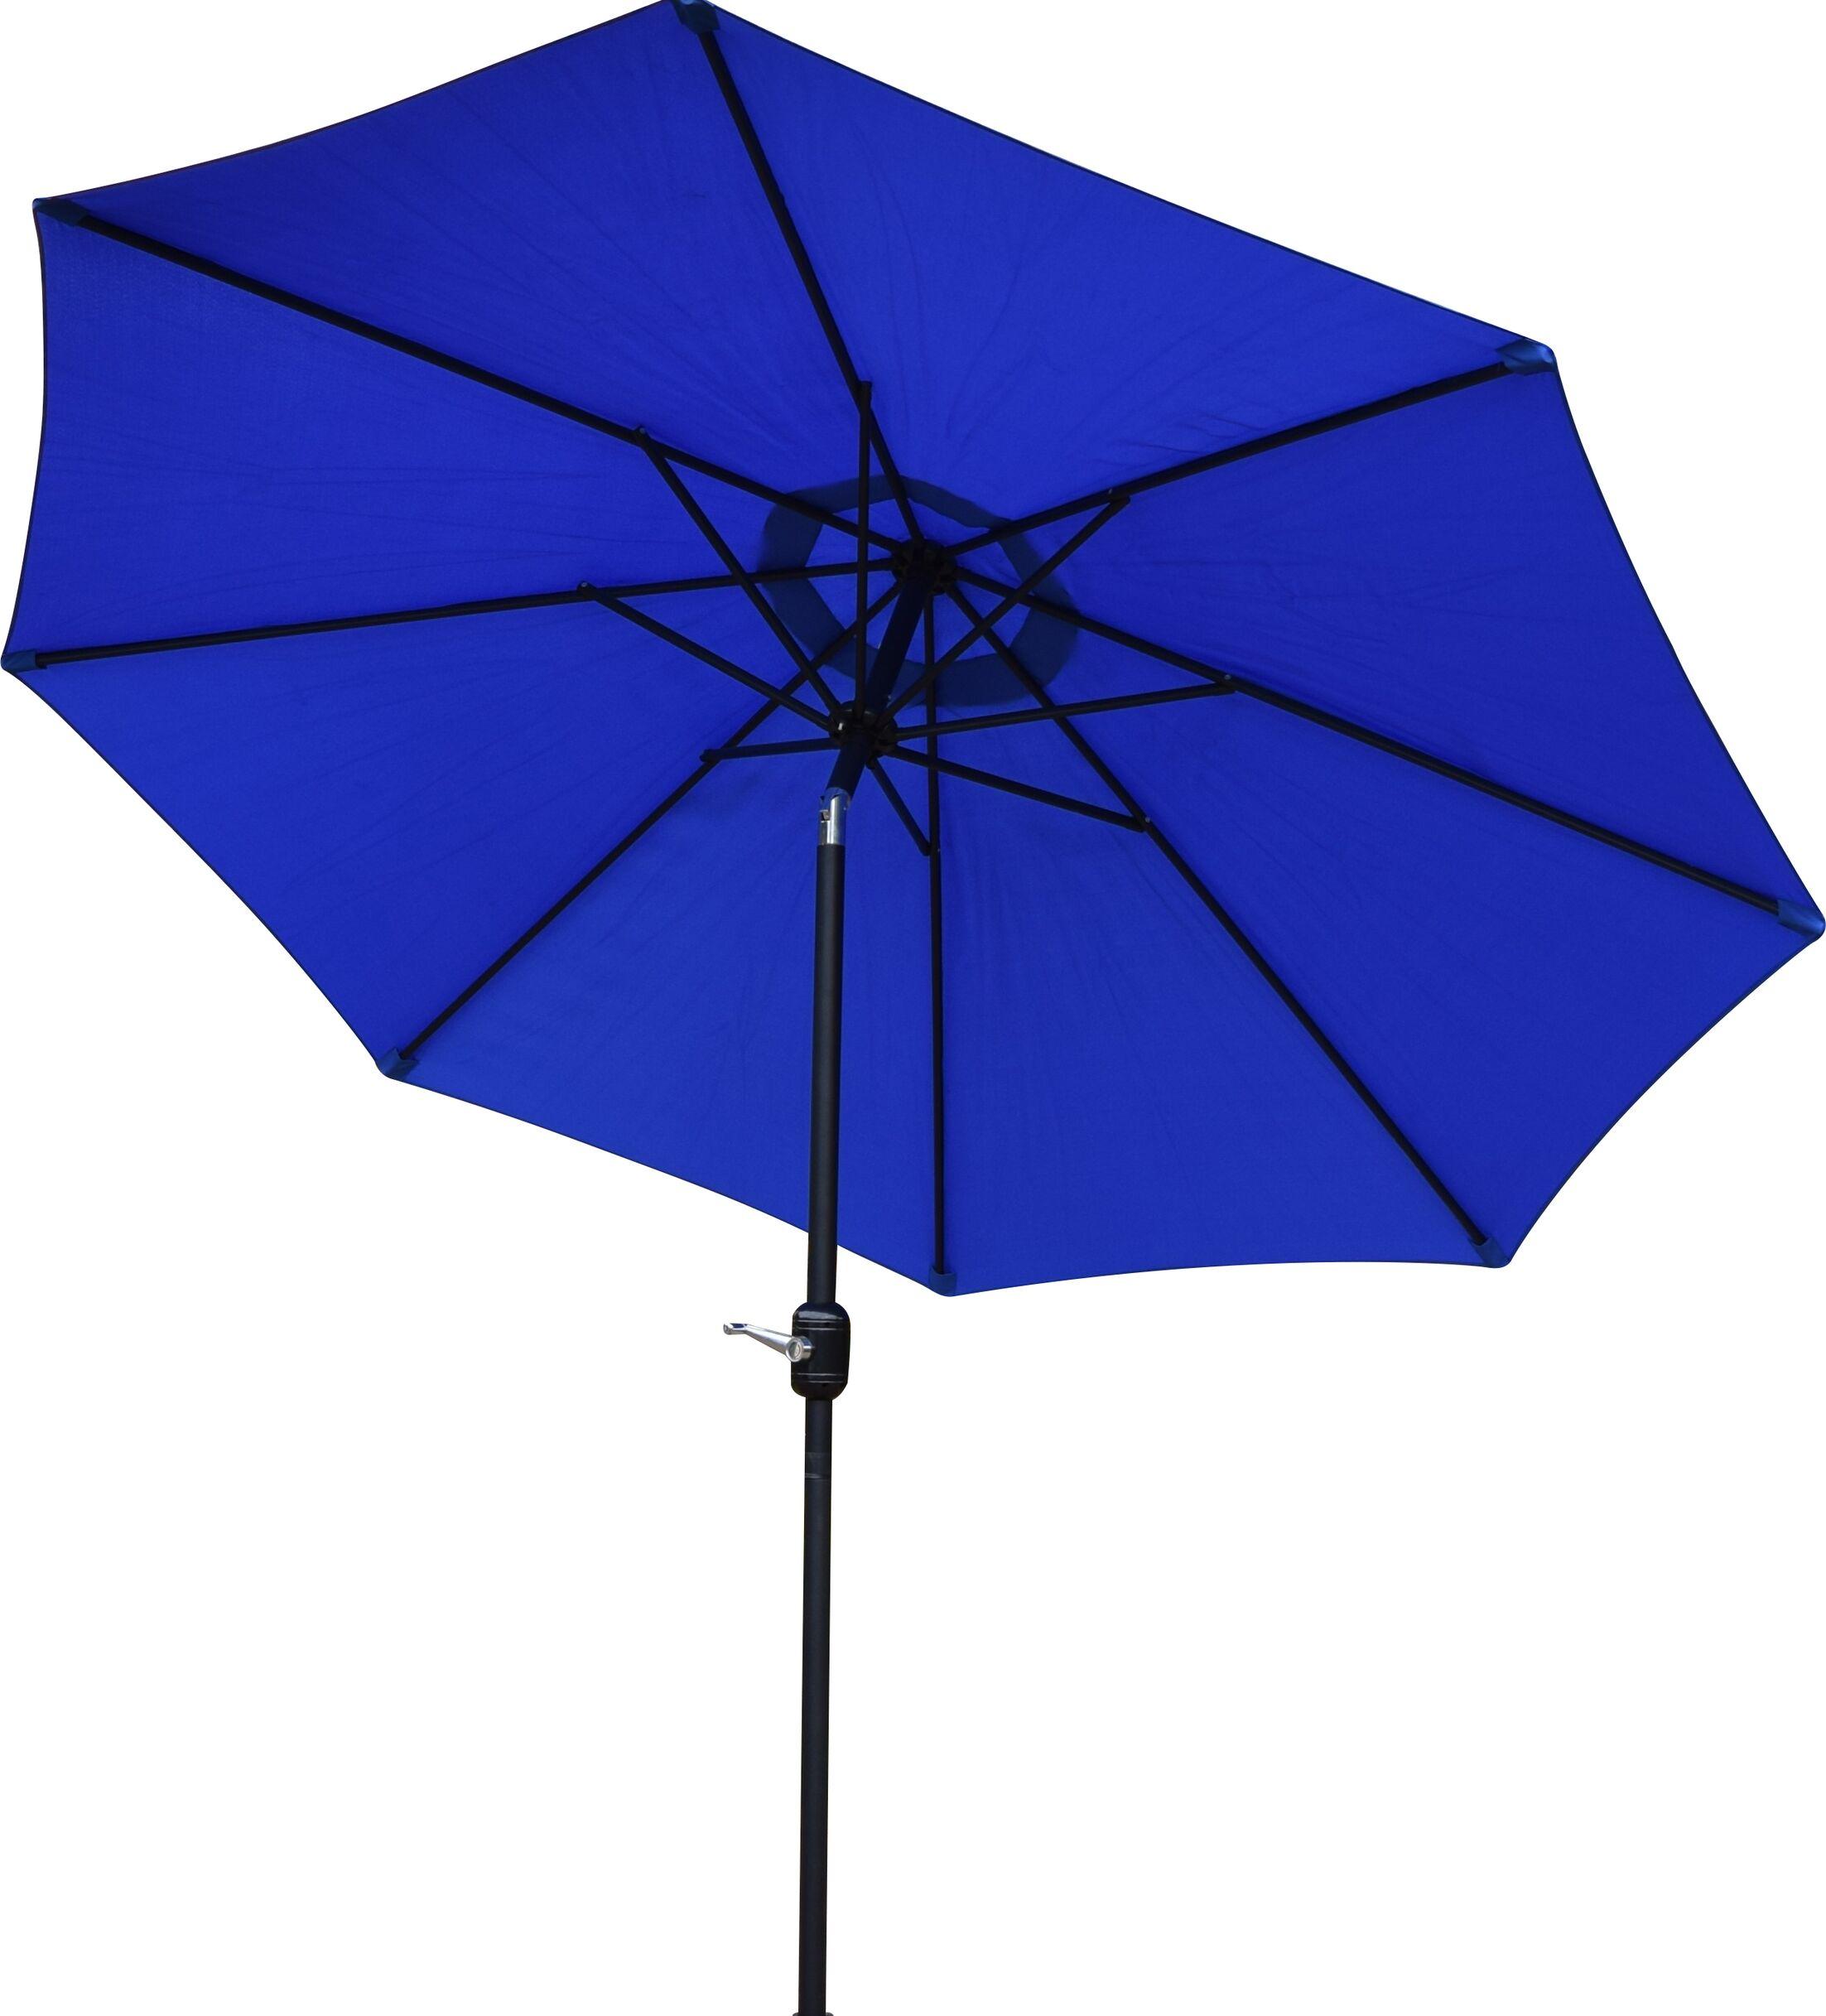 9' Market Umbrella Base Finish: Black, Color: Blue